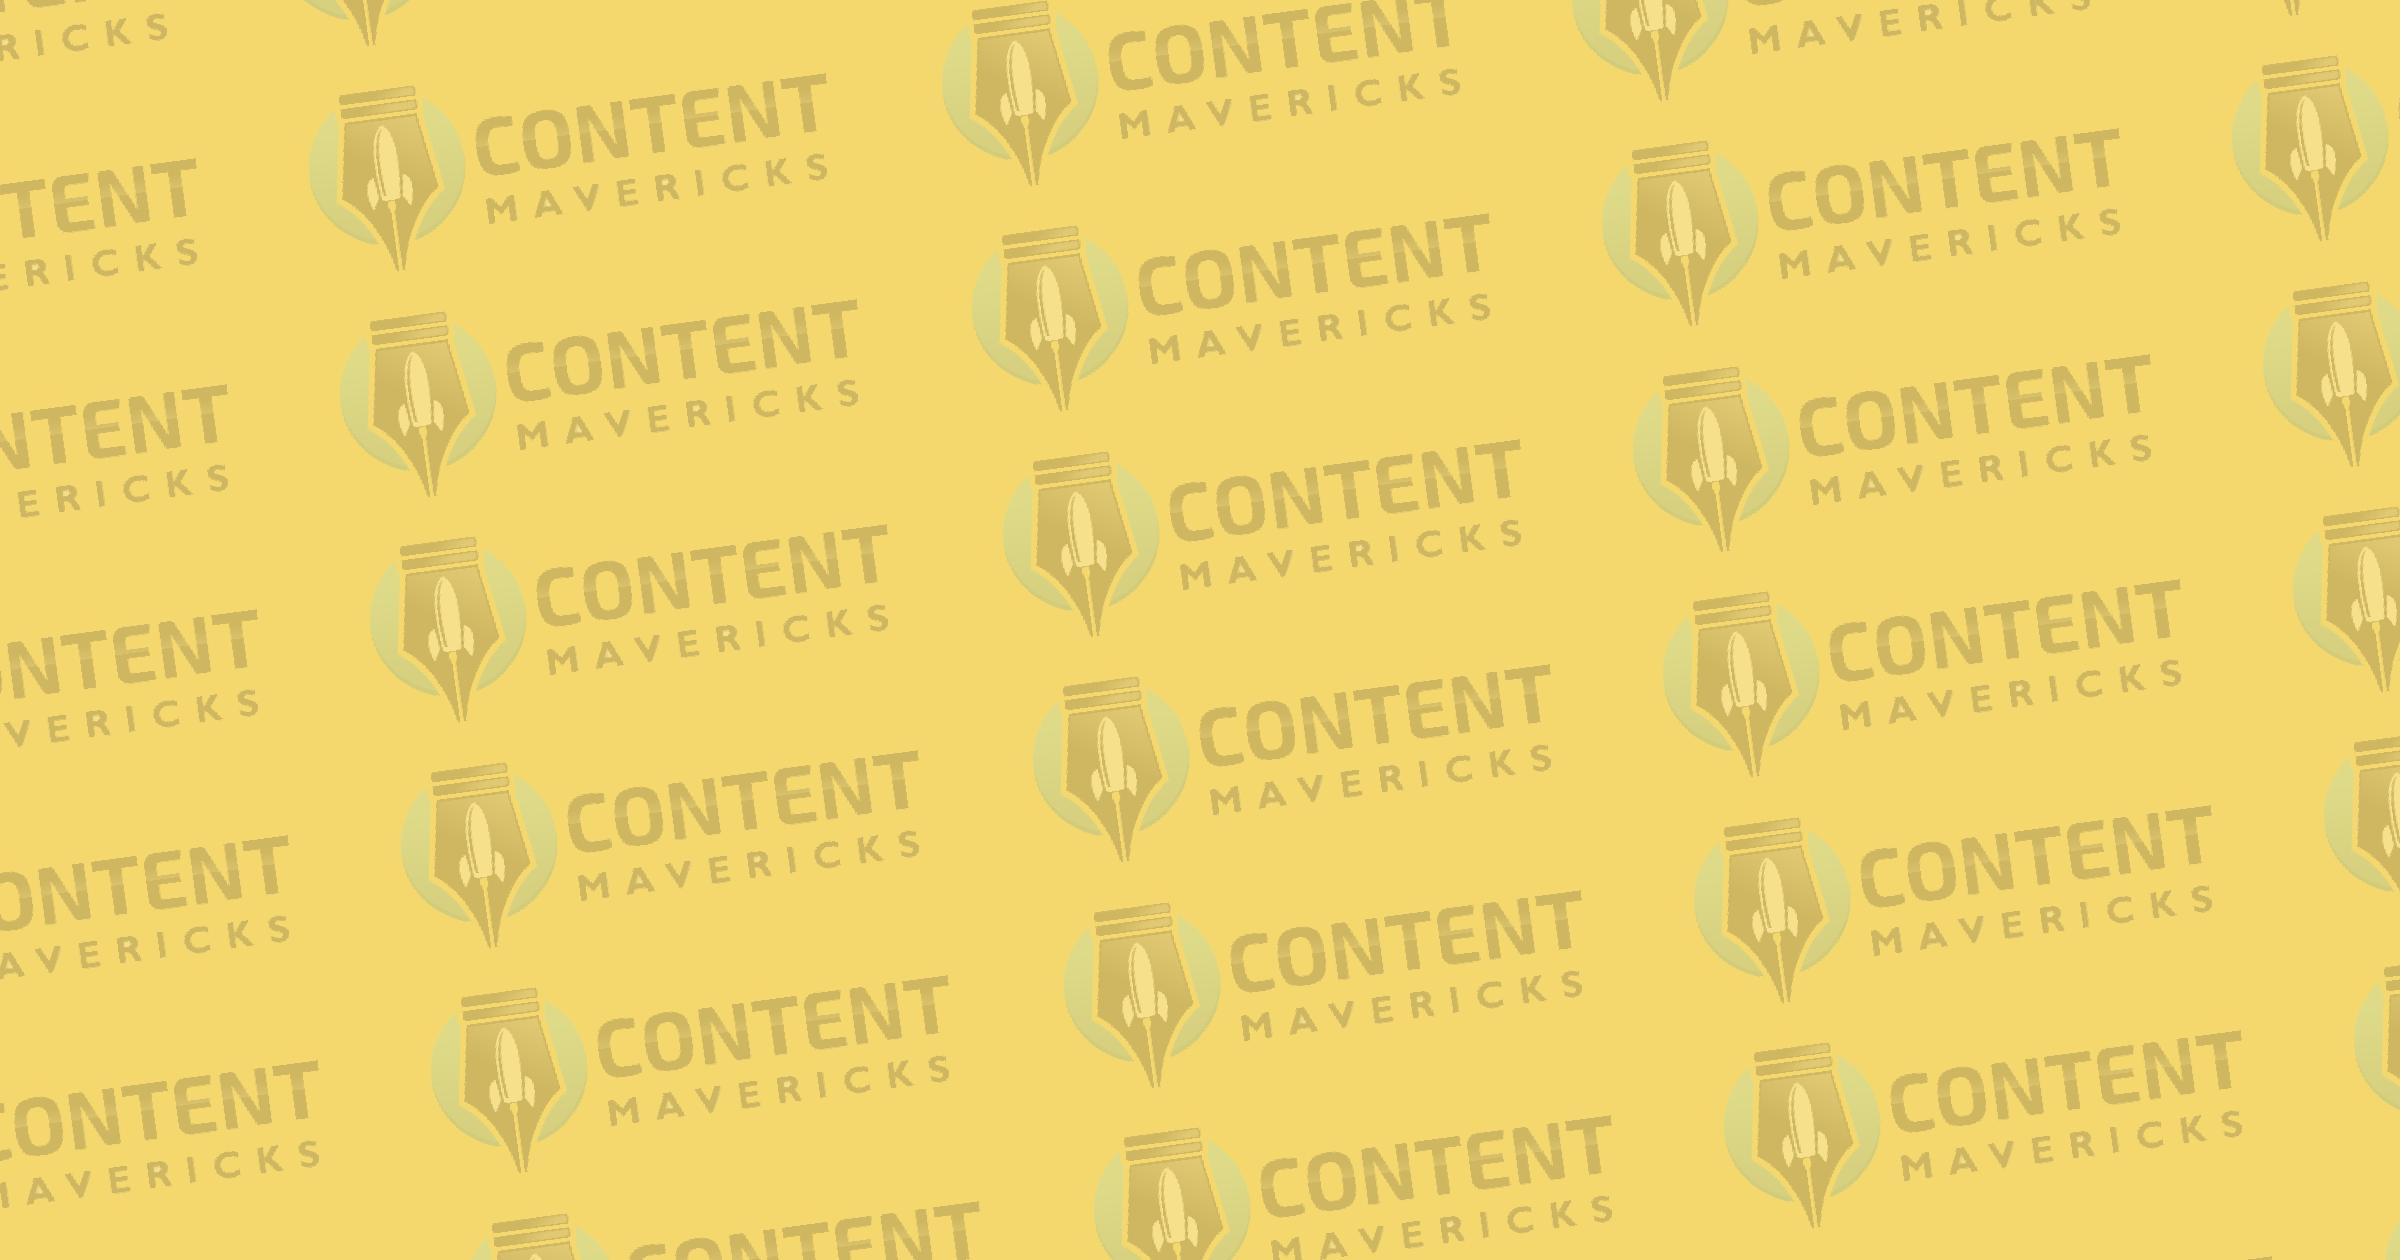 content mavericks image template image